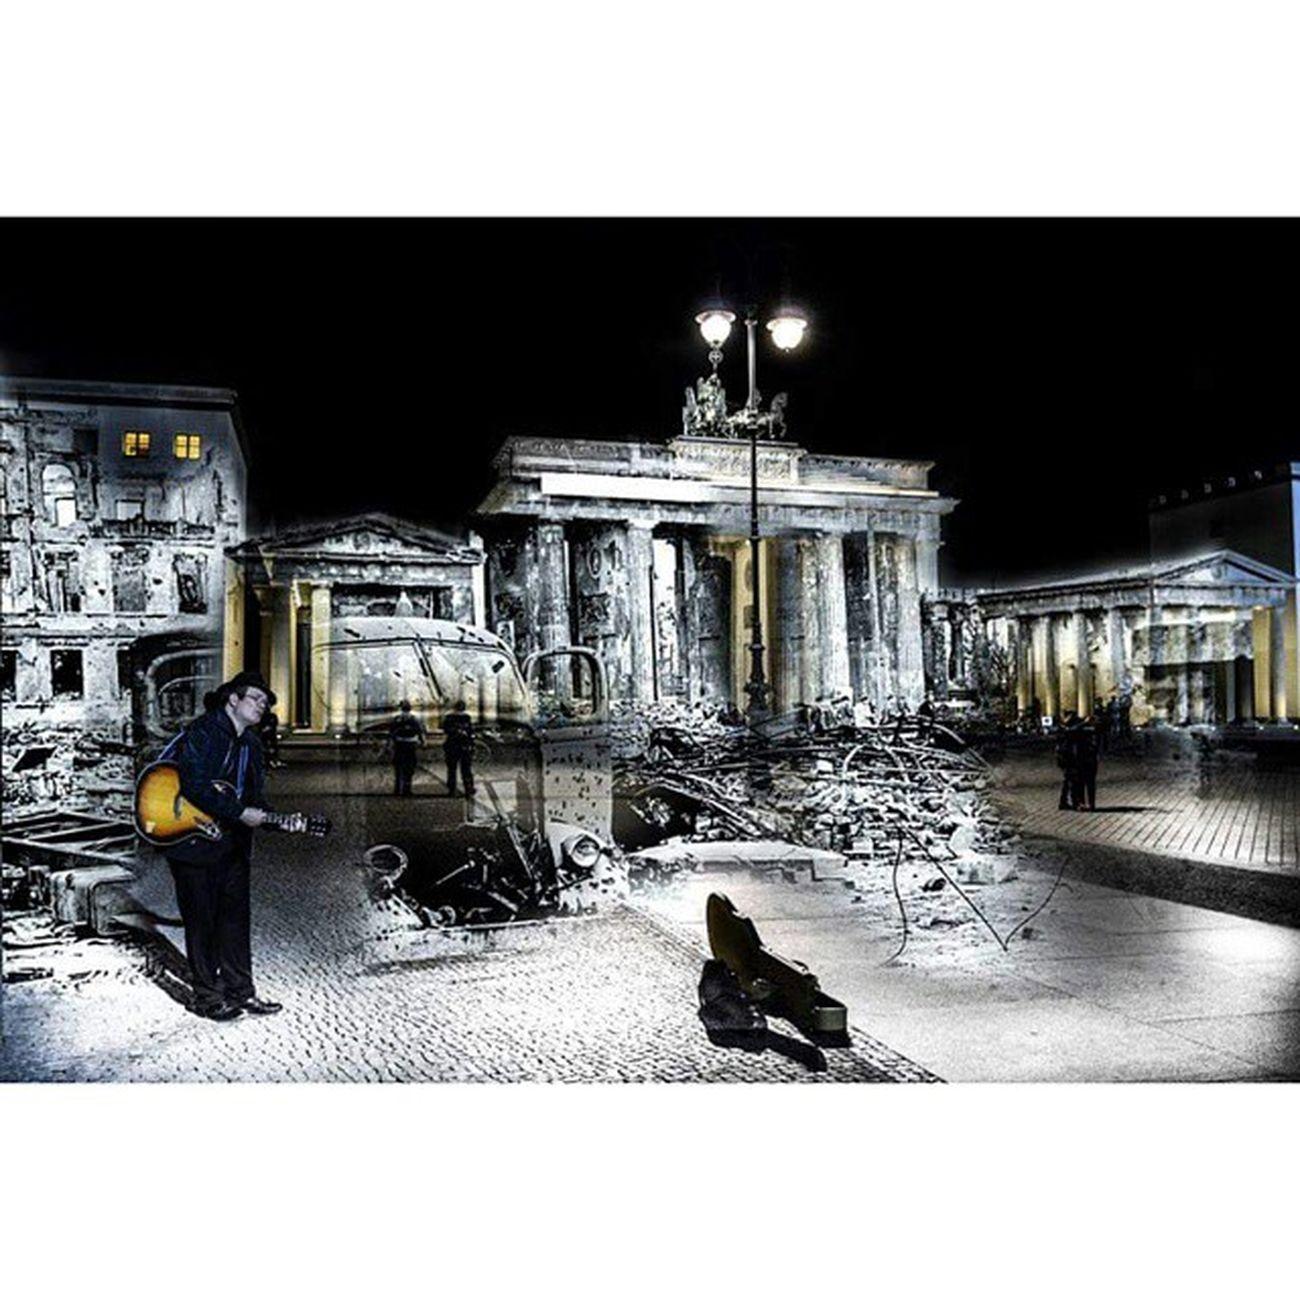 Brandenburg Tor. 1945 - 2015 Berlinklassiker Berliner Branderburgertor Momentogravado Parededevidro Fotoxigenio Picarus_headline Photoshoot